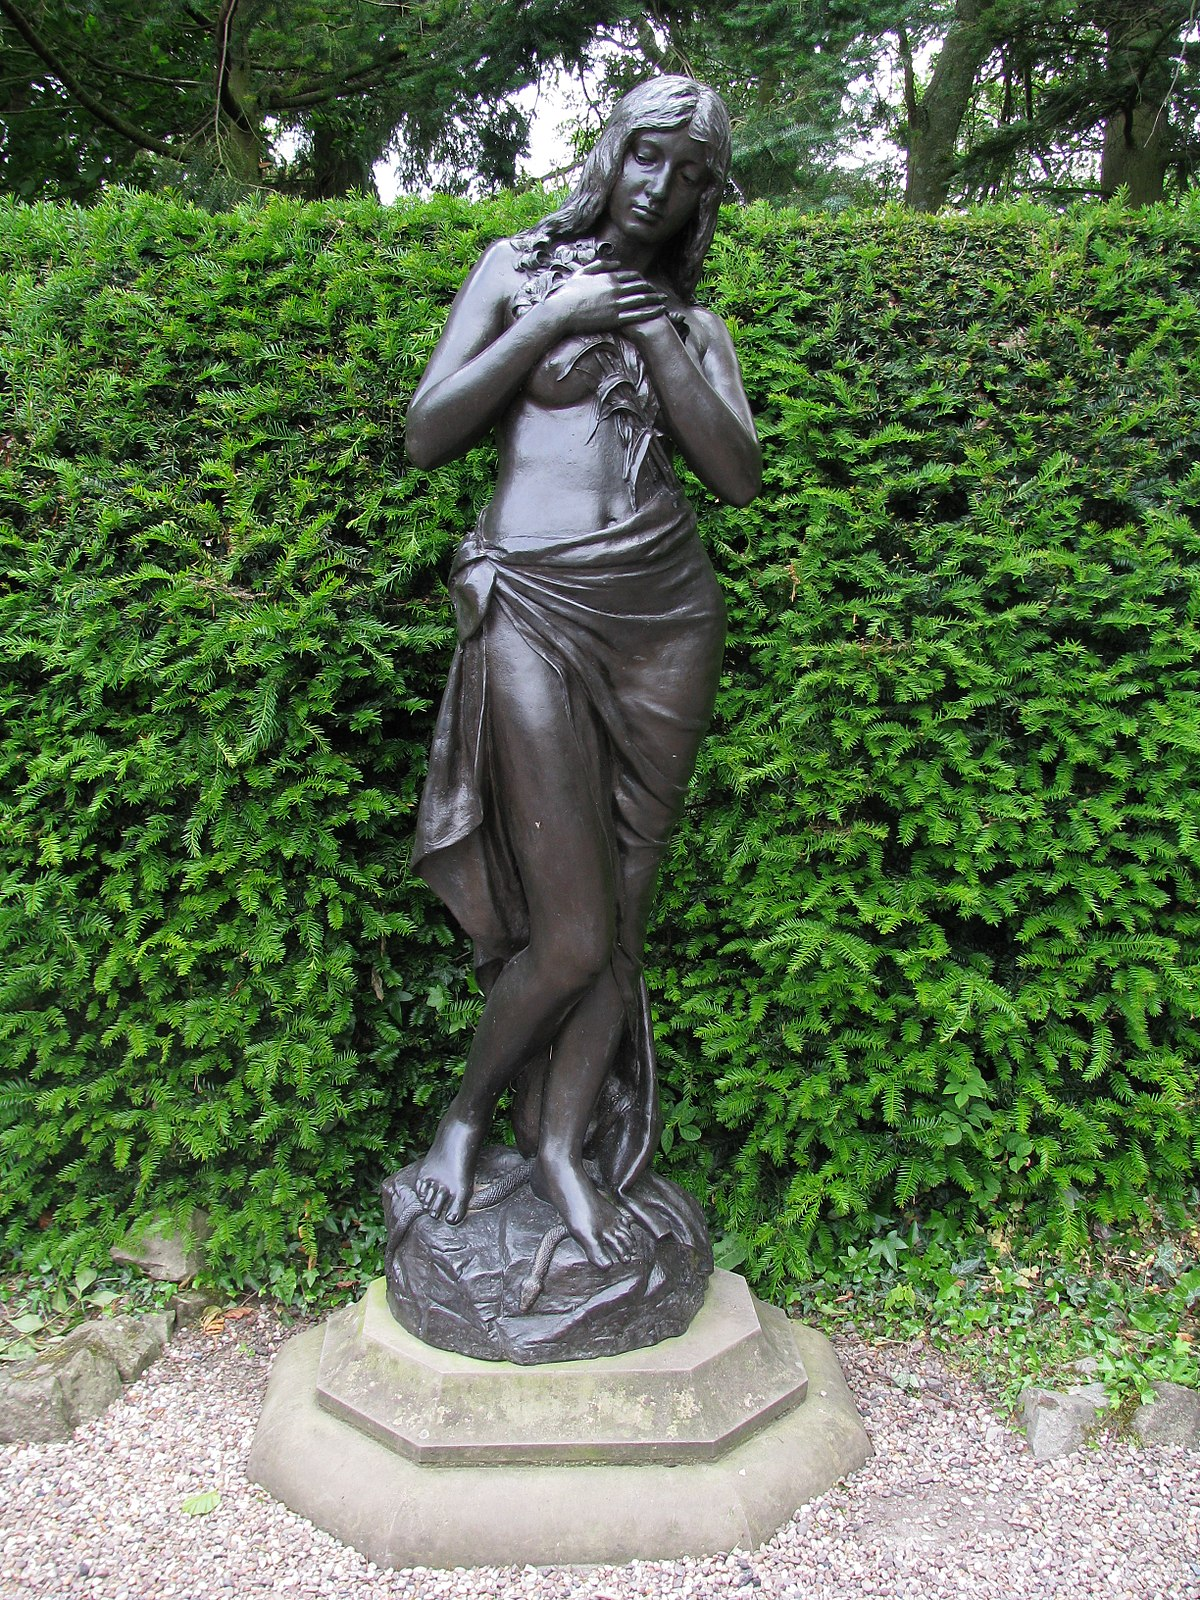 Lithe III Nude Female Wall Sculpture, STU-Home